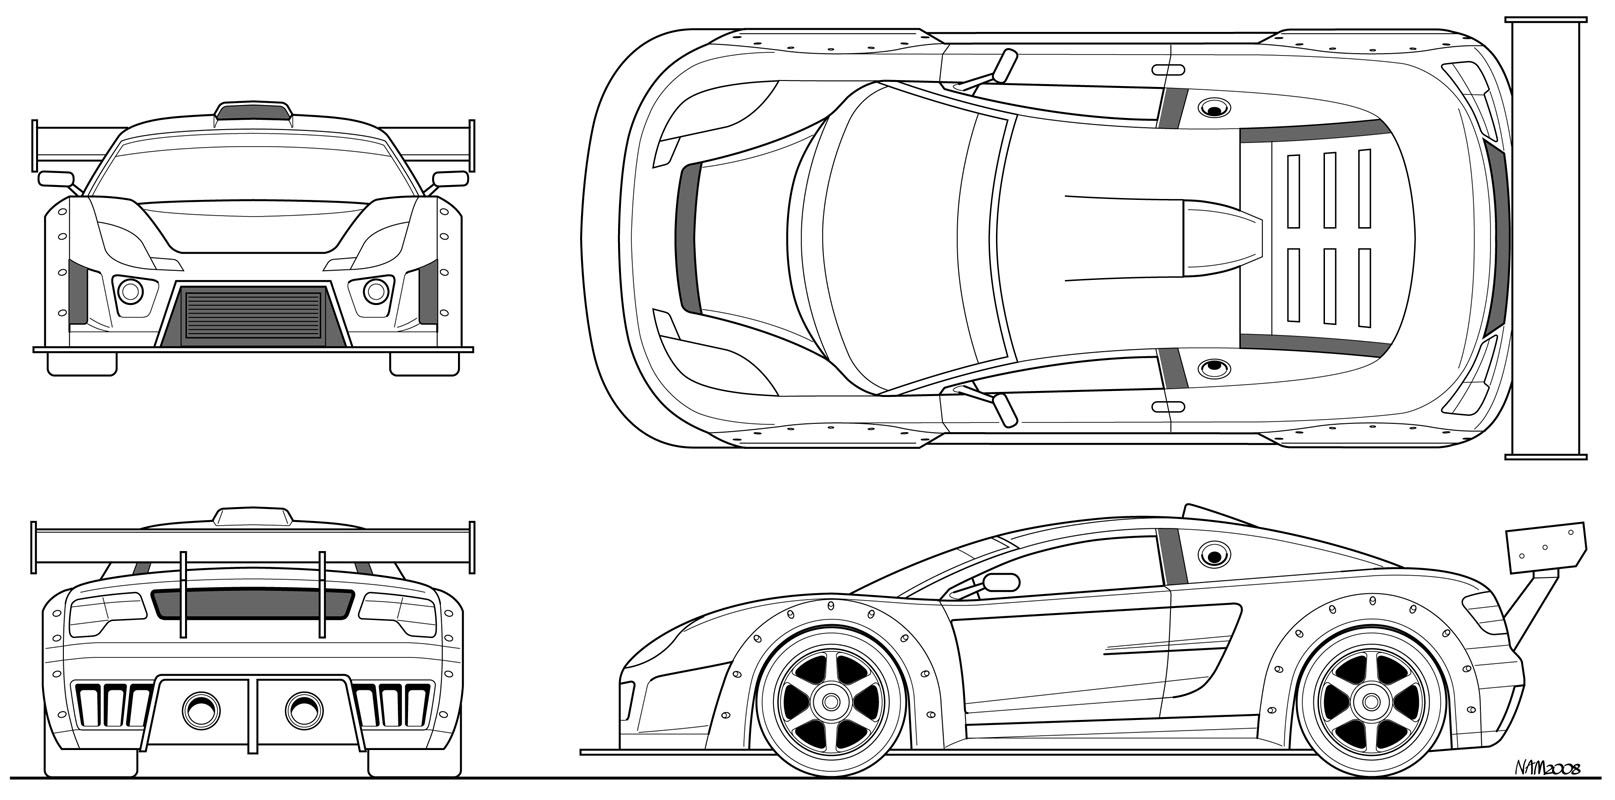 supercar 40 blueprints new jpg  1615 u00d7800